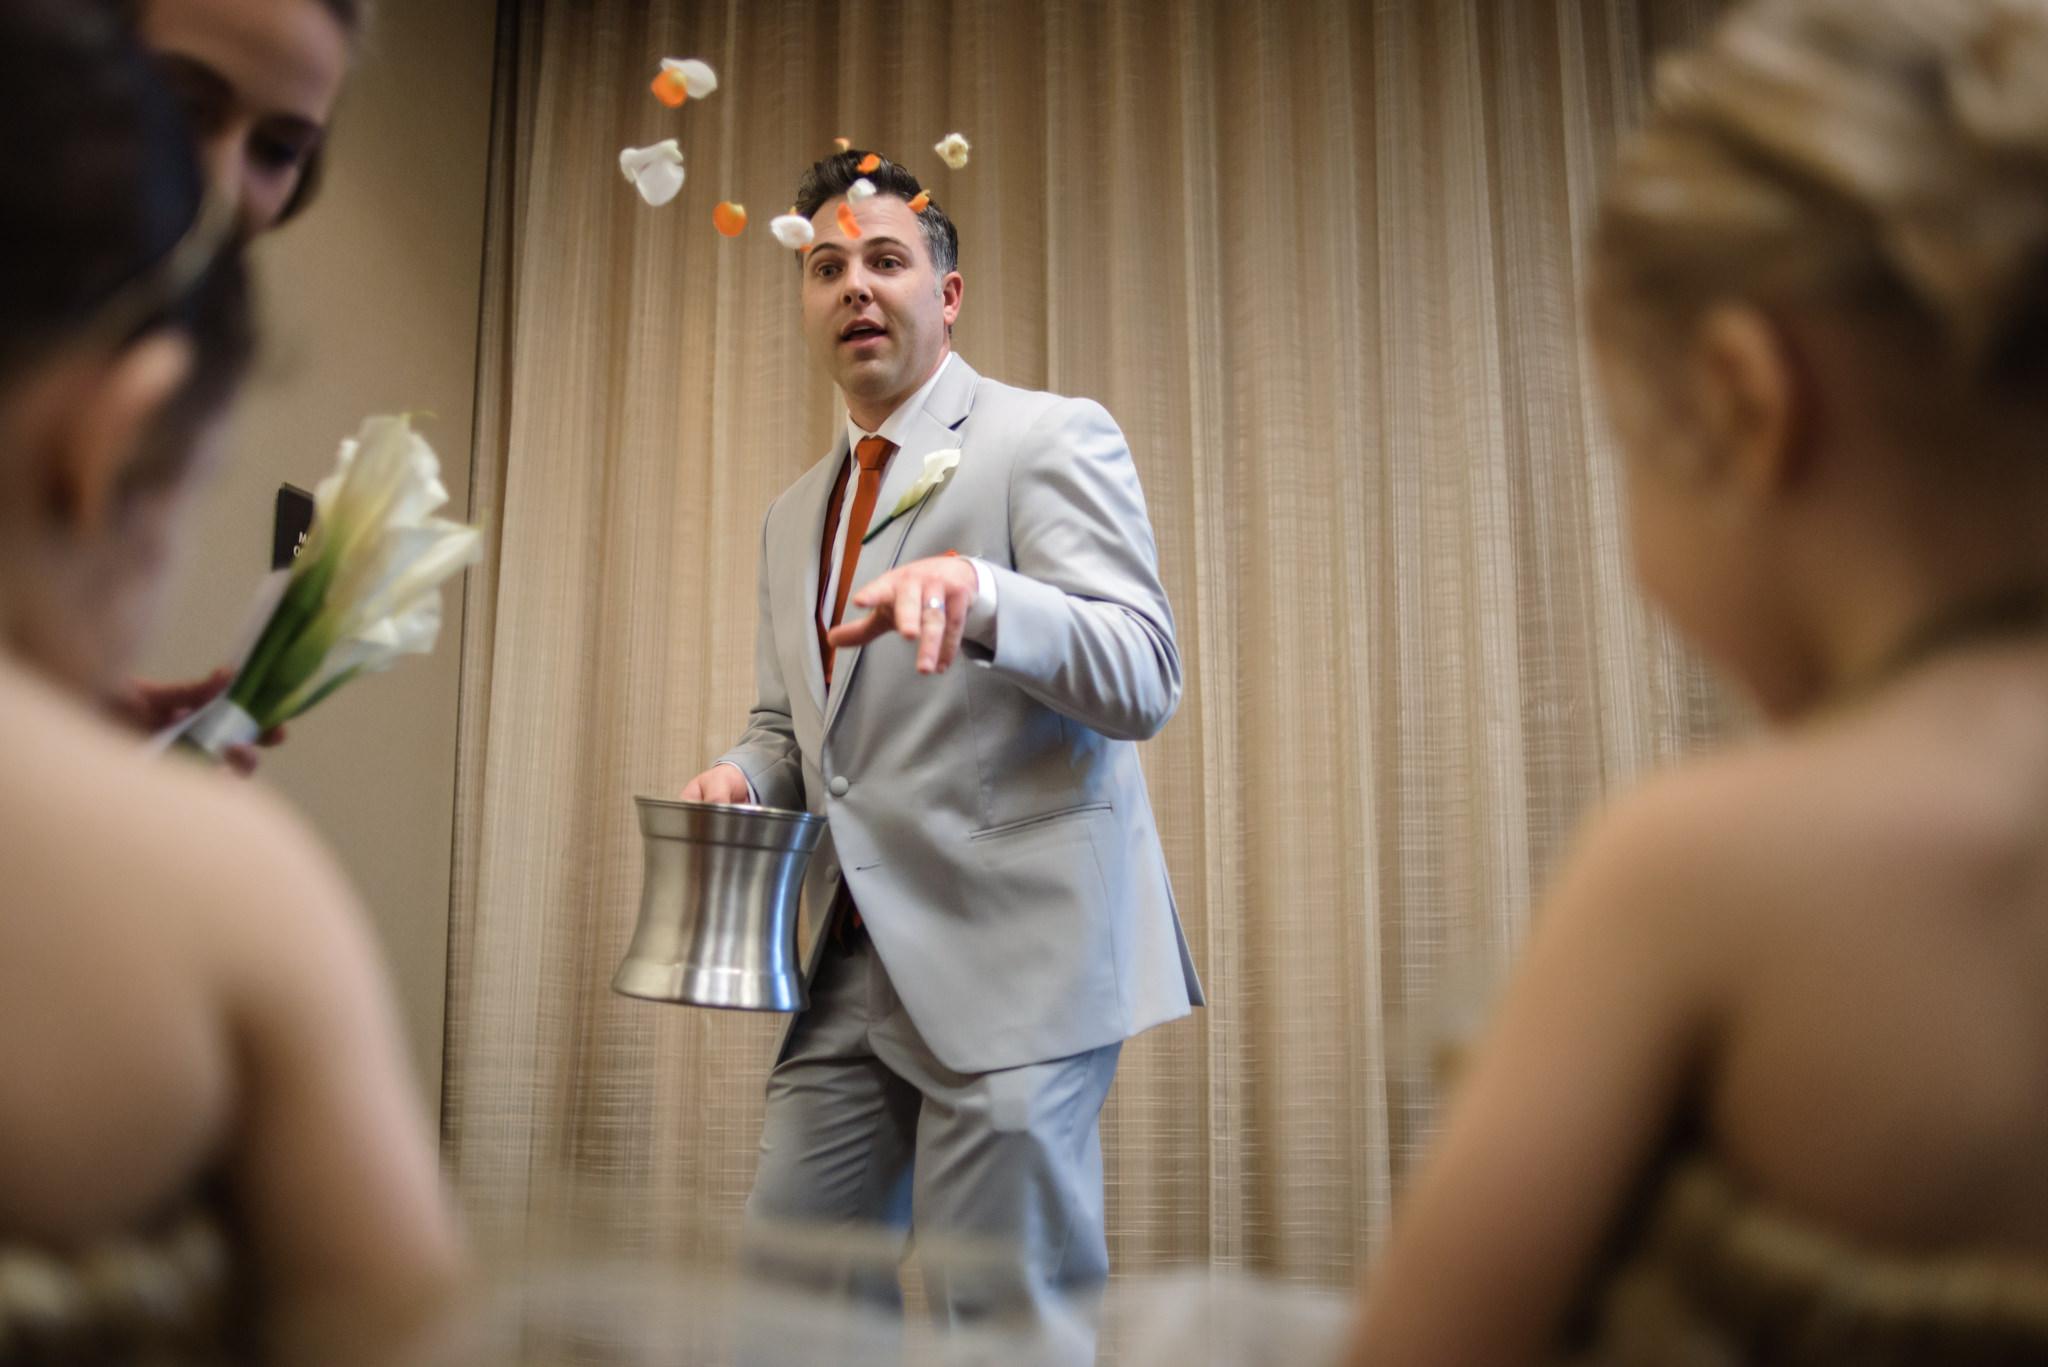 HILTON-OMAHA-WEDDING-PHOTOGRAPHER-JM-STUDIOS-OMAHA-LIV-BRICE-021.jpg